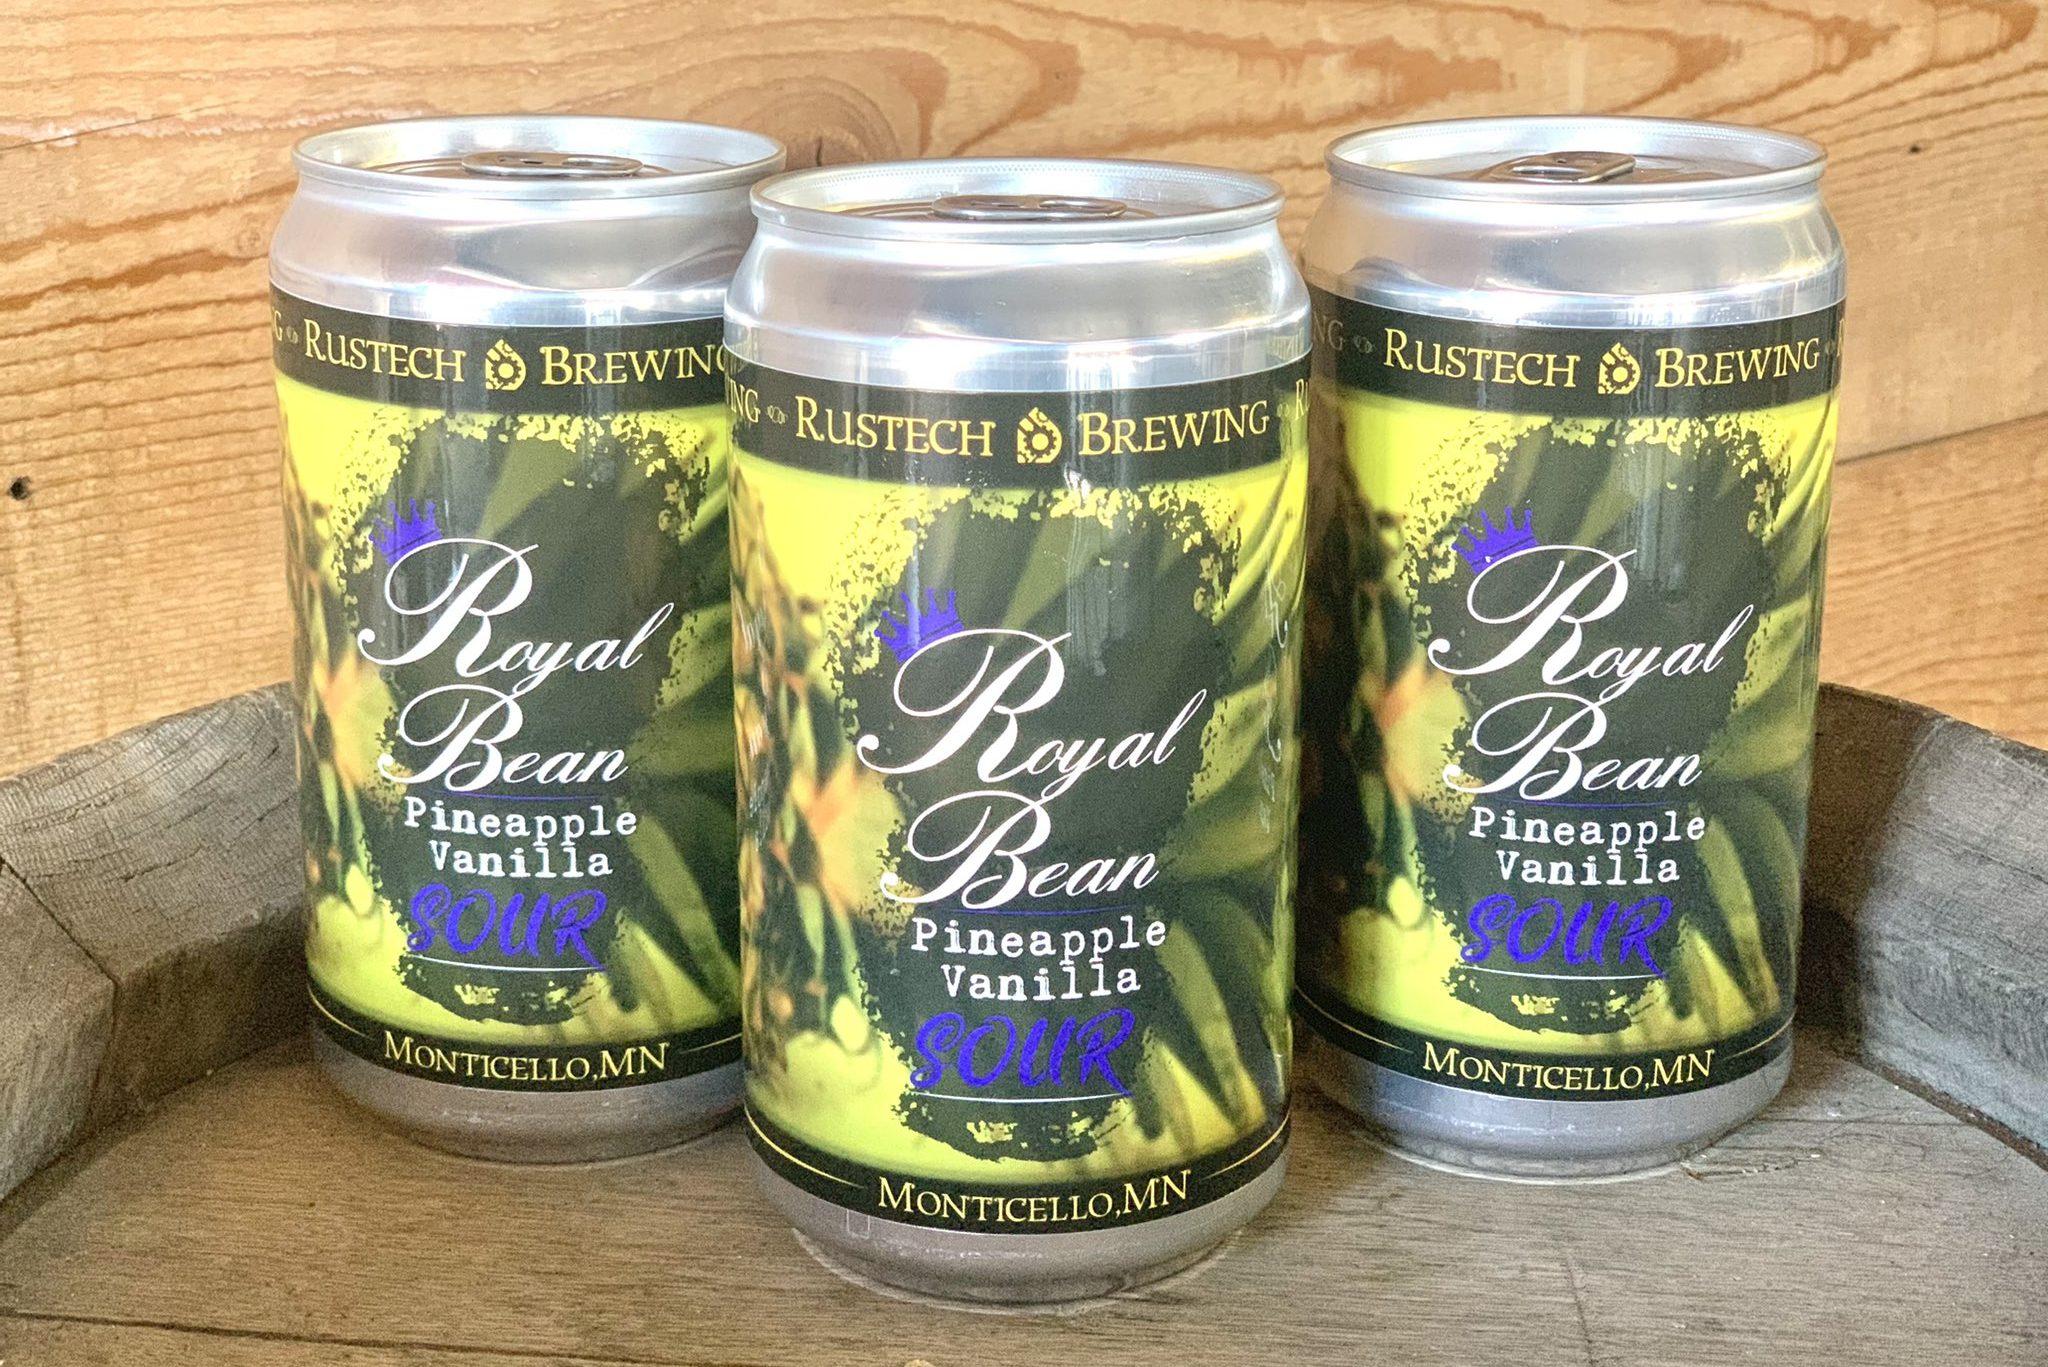 Rustech Royal Bean Pineapple Vanilla Sour • Photo via Rustech Brewing